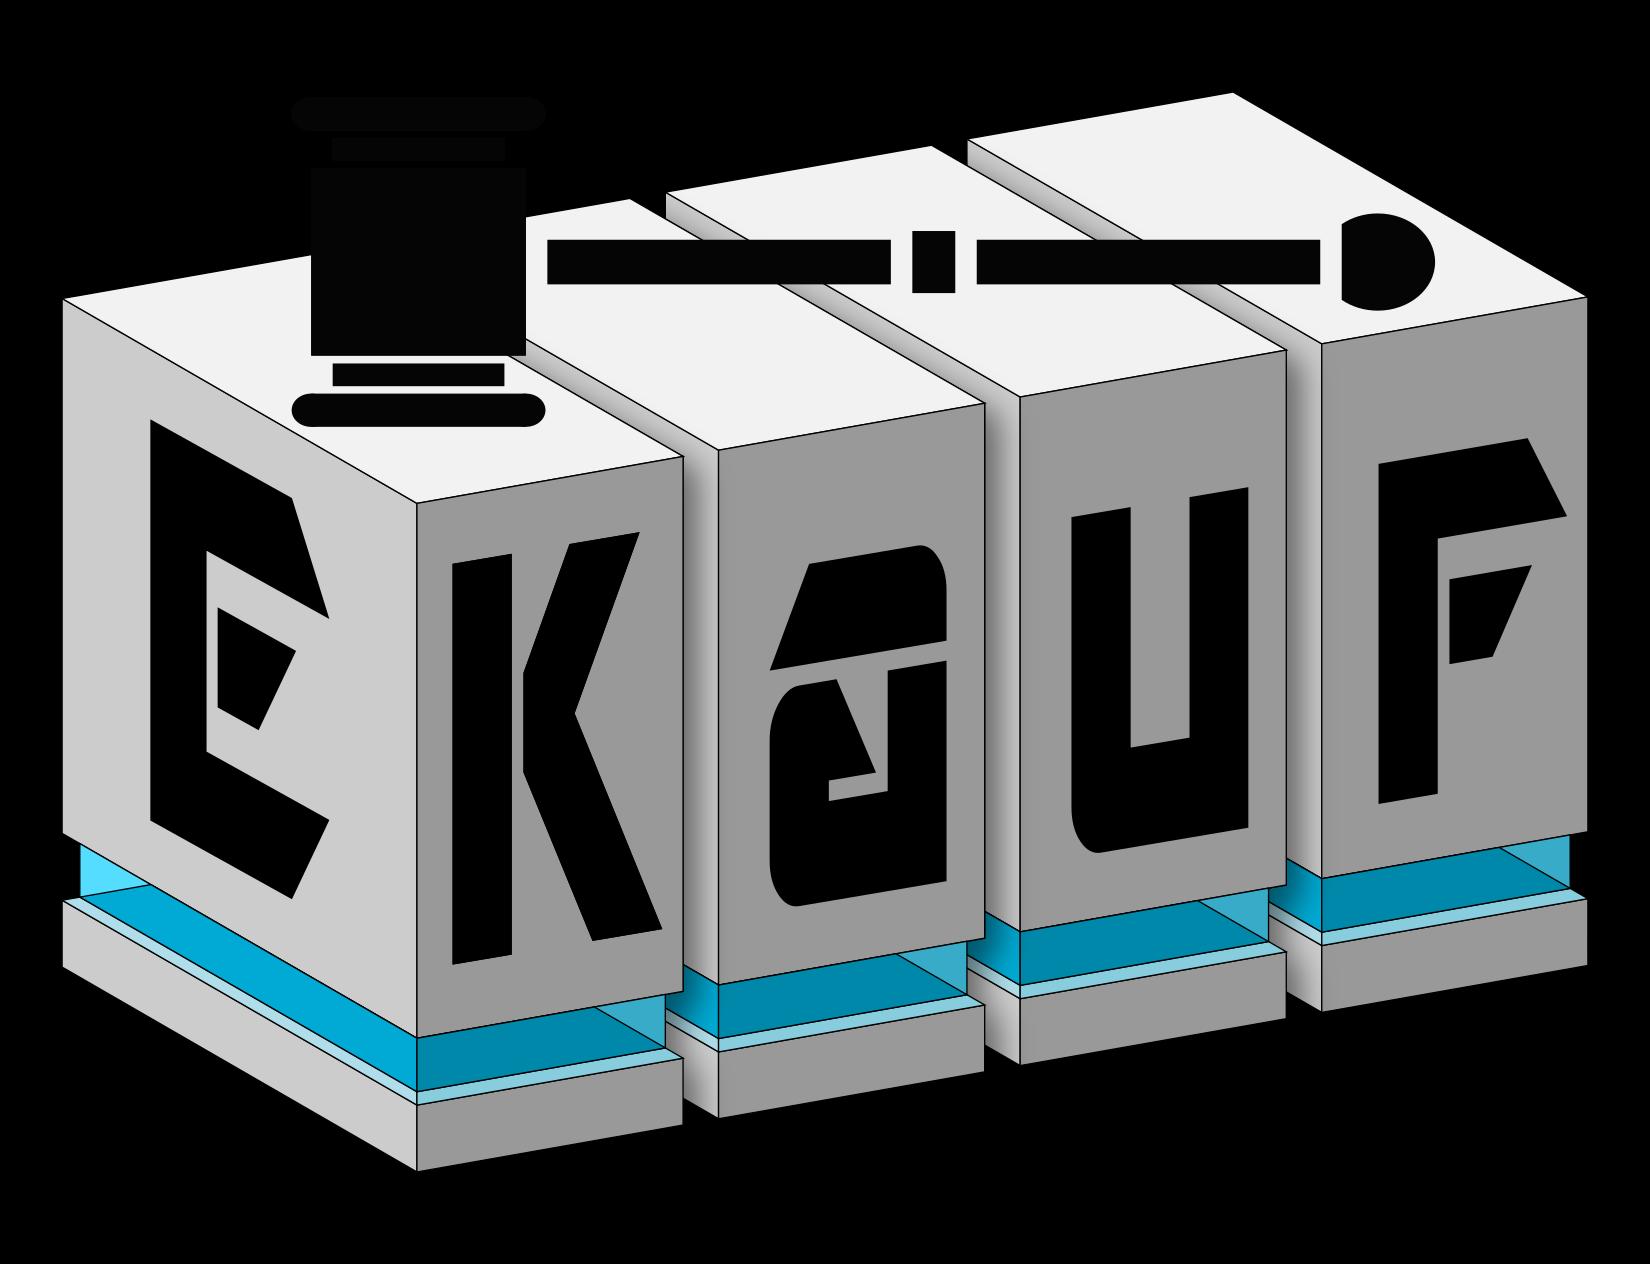 eKauf project